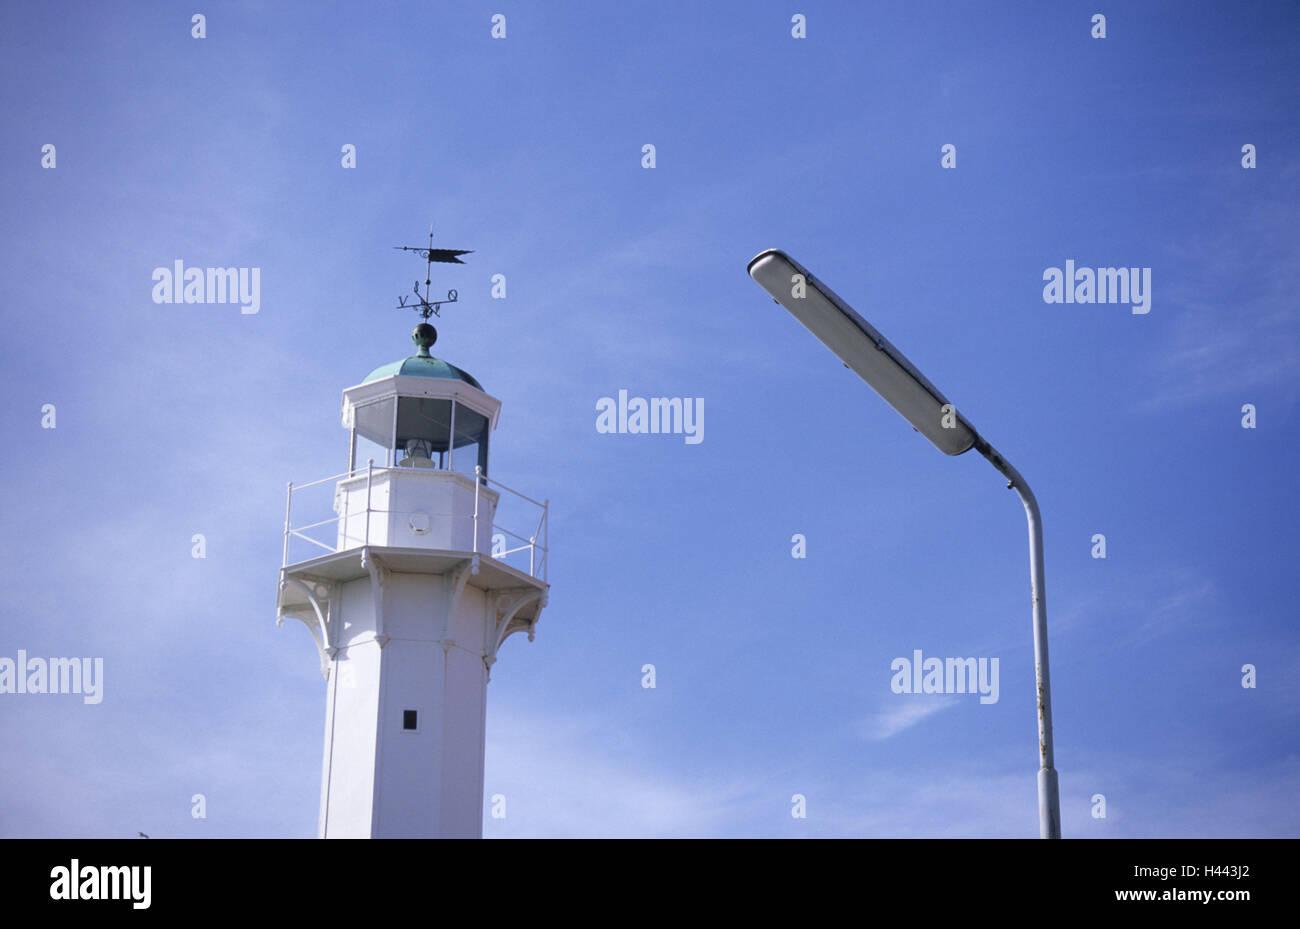 Denmark, Bornholm, Running, Lighthouse, Beacon, Sea figure, Navigation, Orientation, Lamp, Street lamp, Neon, Contrasts, - Stock Image